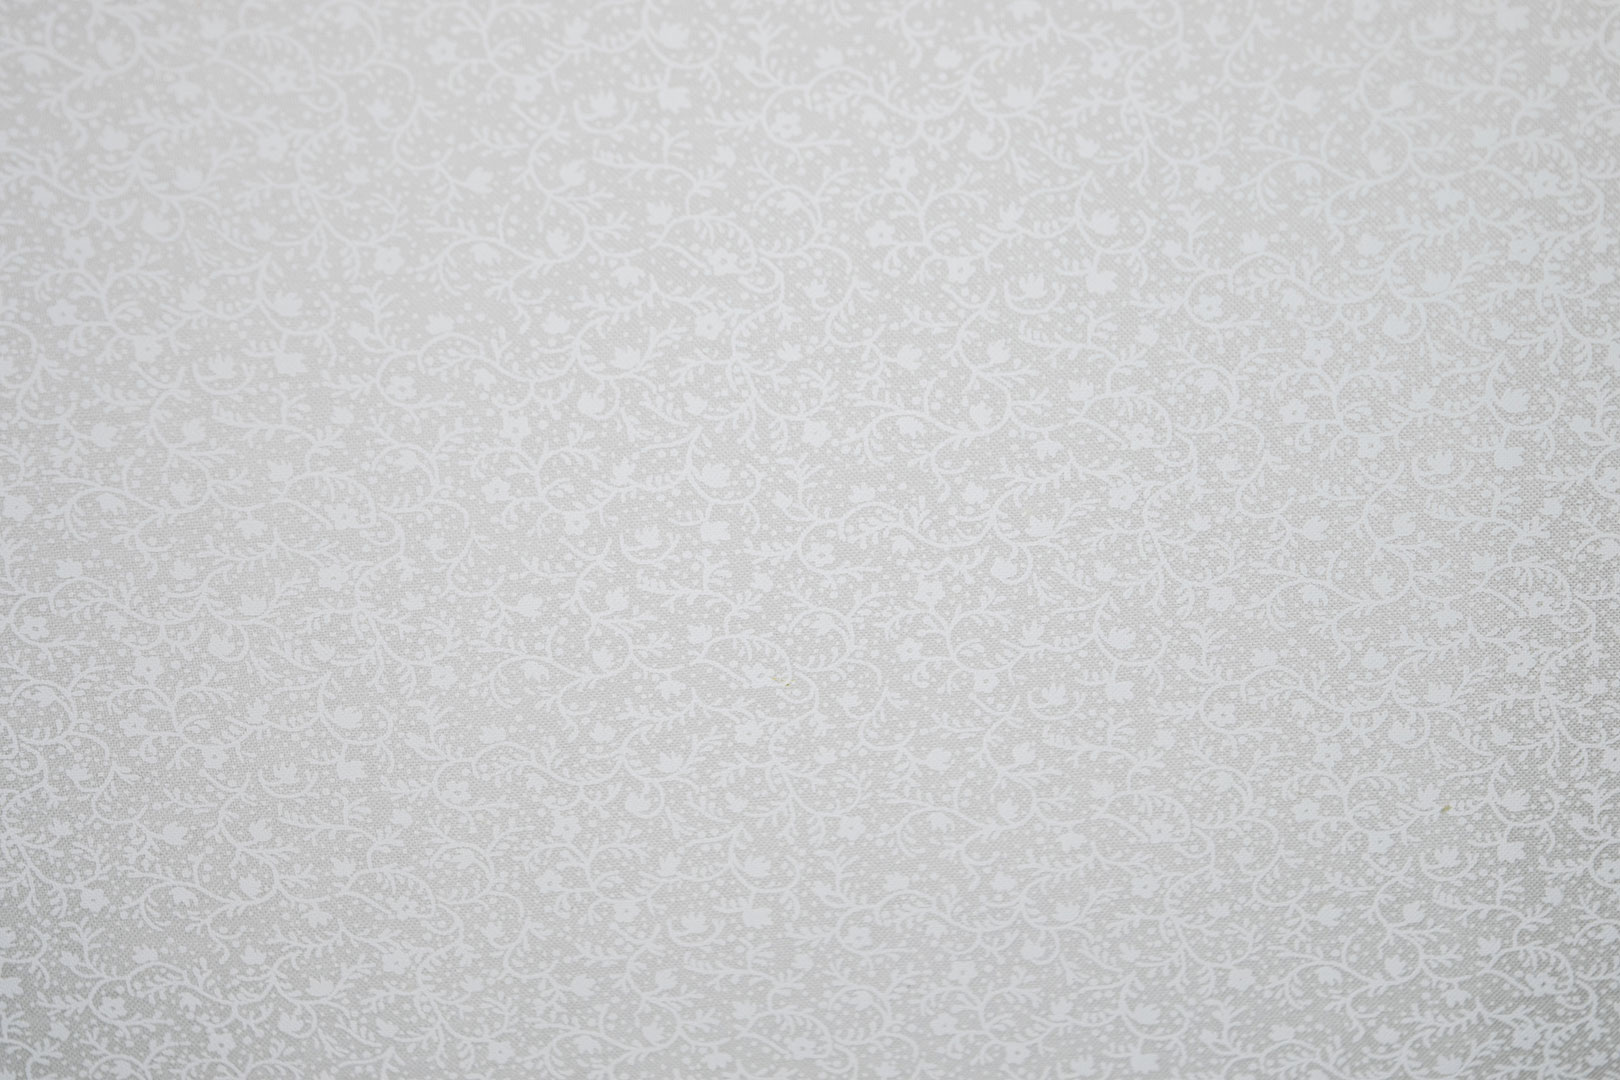 "8_20065_ww   44/45"" 68/68, 100% Carded Cotton"